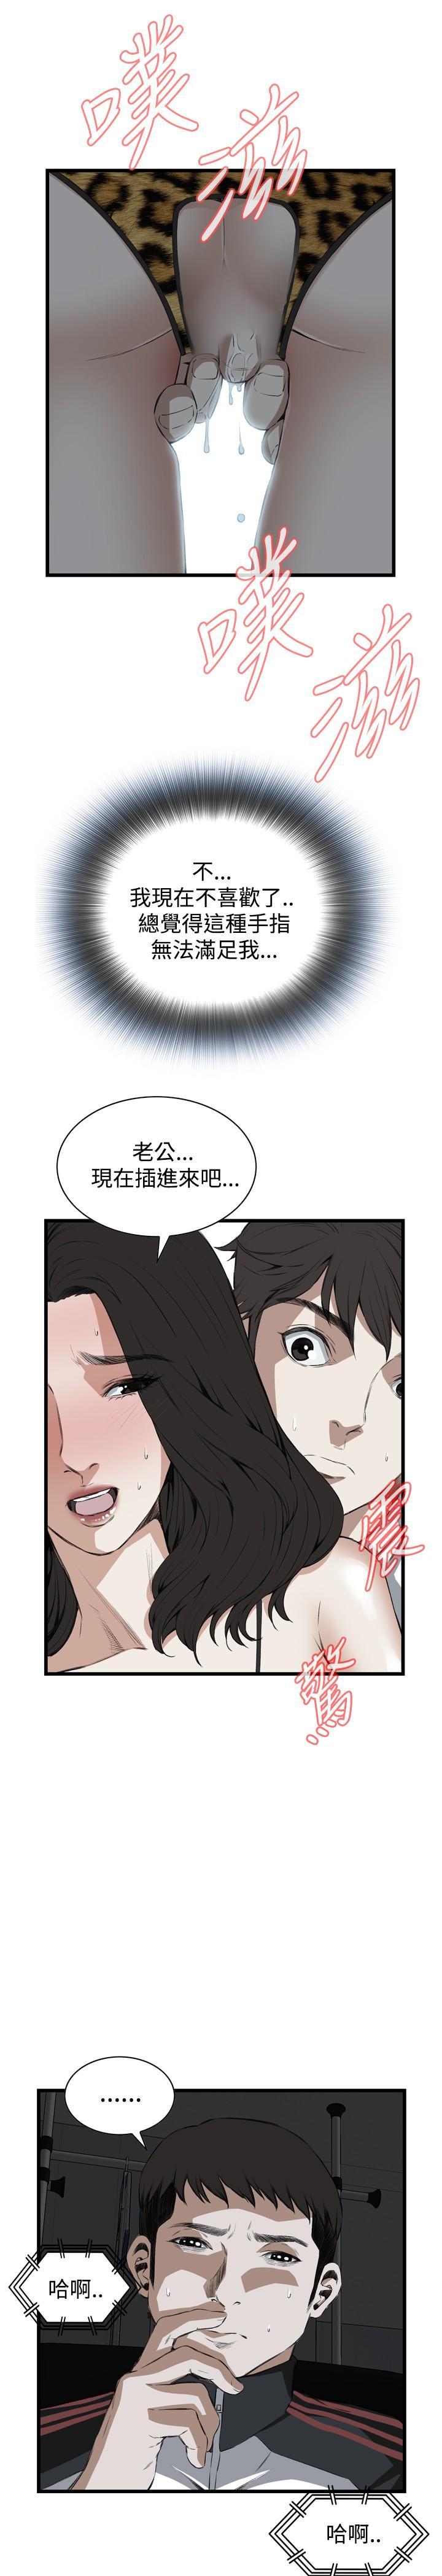 Take a Peek 偷窥 Ch.39~55 [Chinese]中文 444